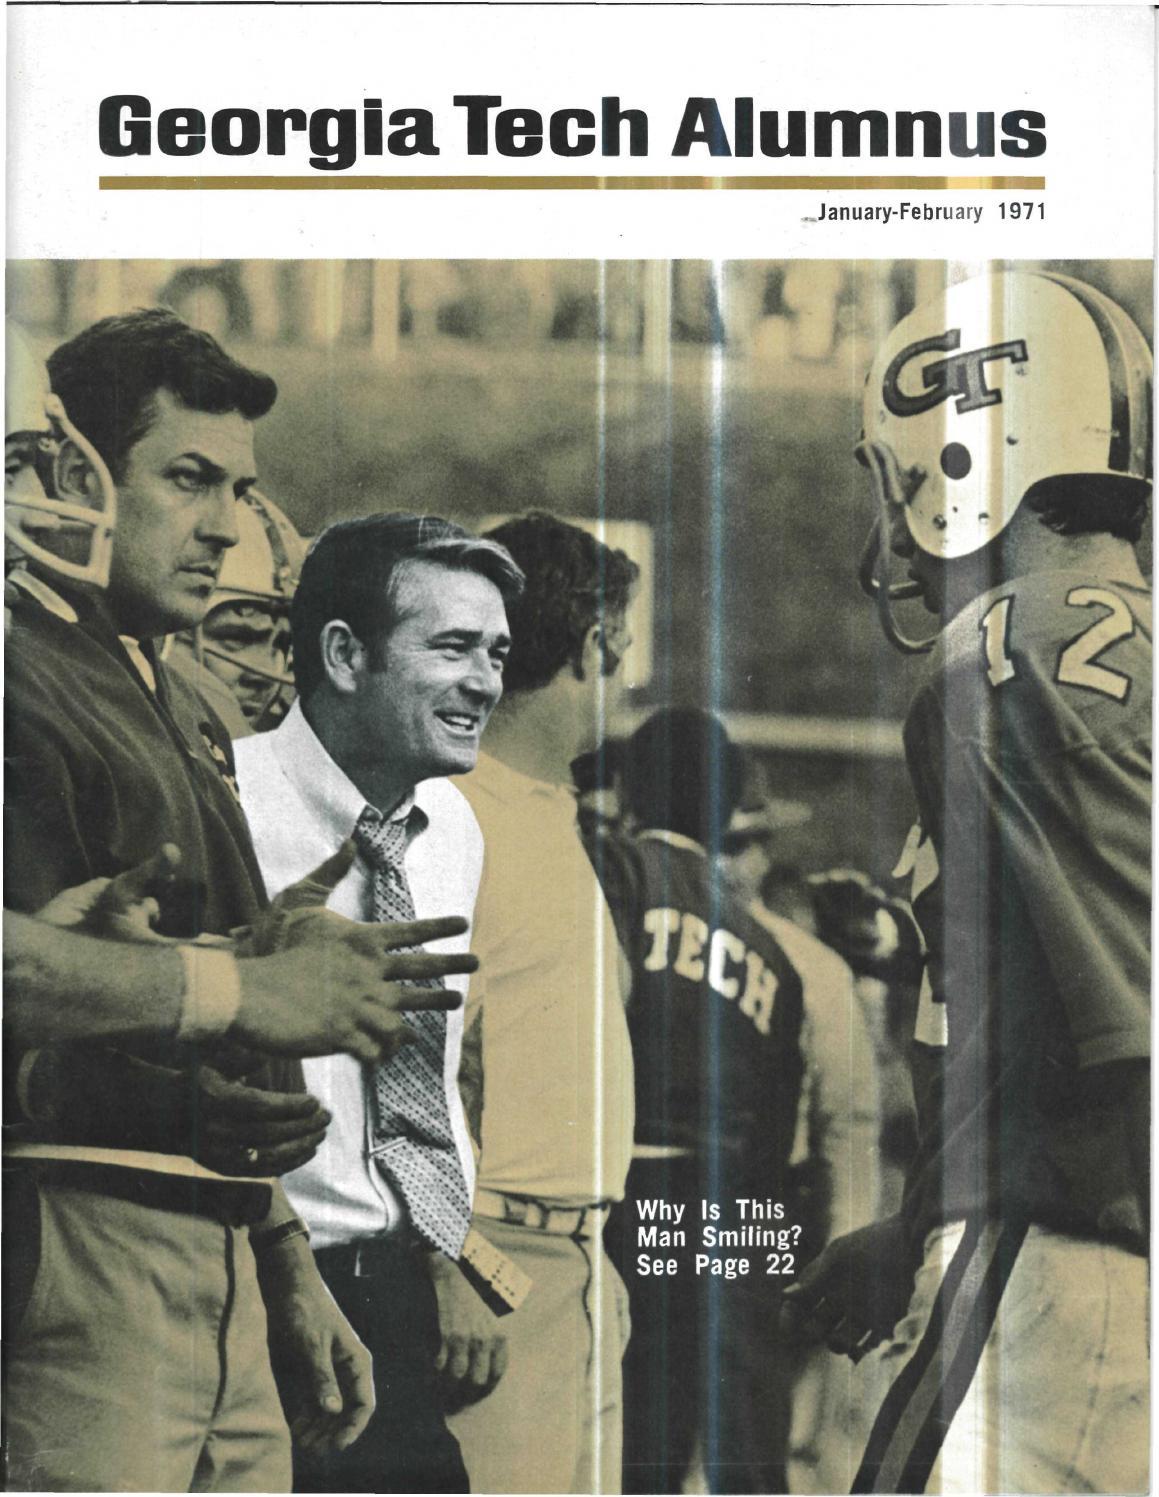 Georgia Tech Alumni Magazine Vol 49 No 03 1971 By 1963 Thin Circuit Boards Made Western Electric Print Ad Techie Ret Association Issuu